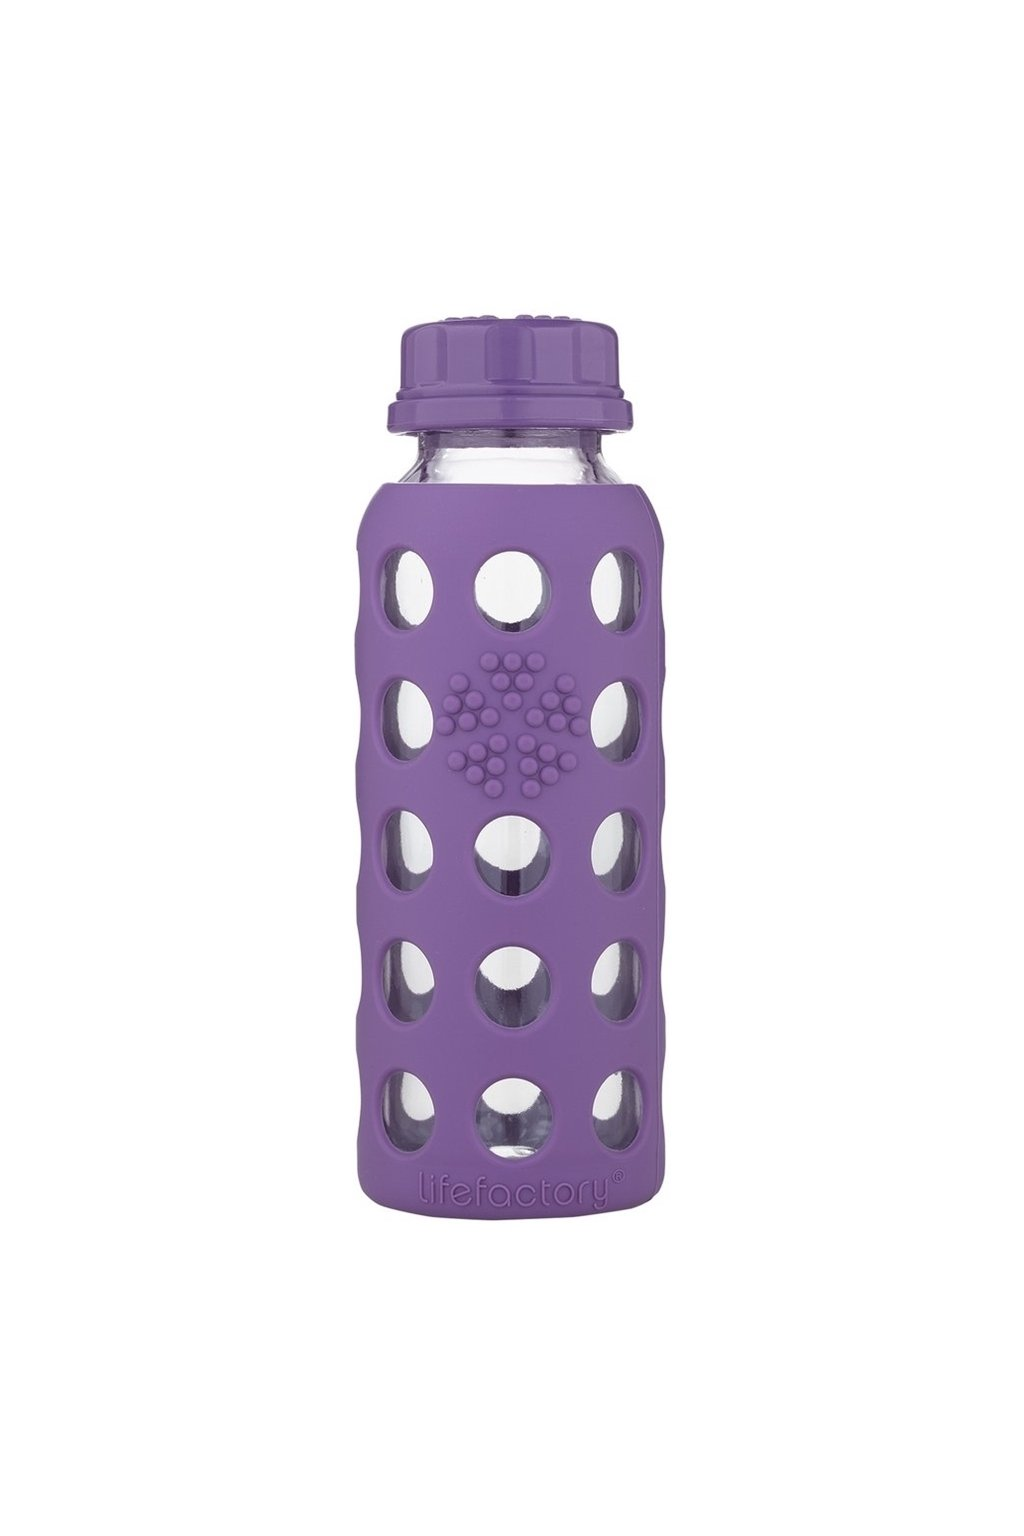 Sklenena lahev pro deti Lifefactory 260 ml fialova